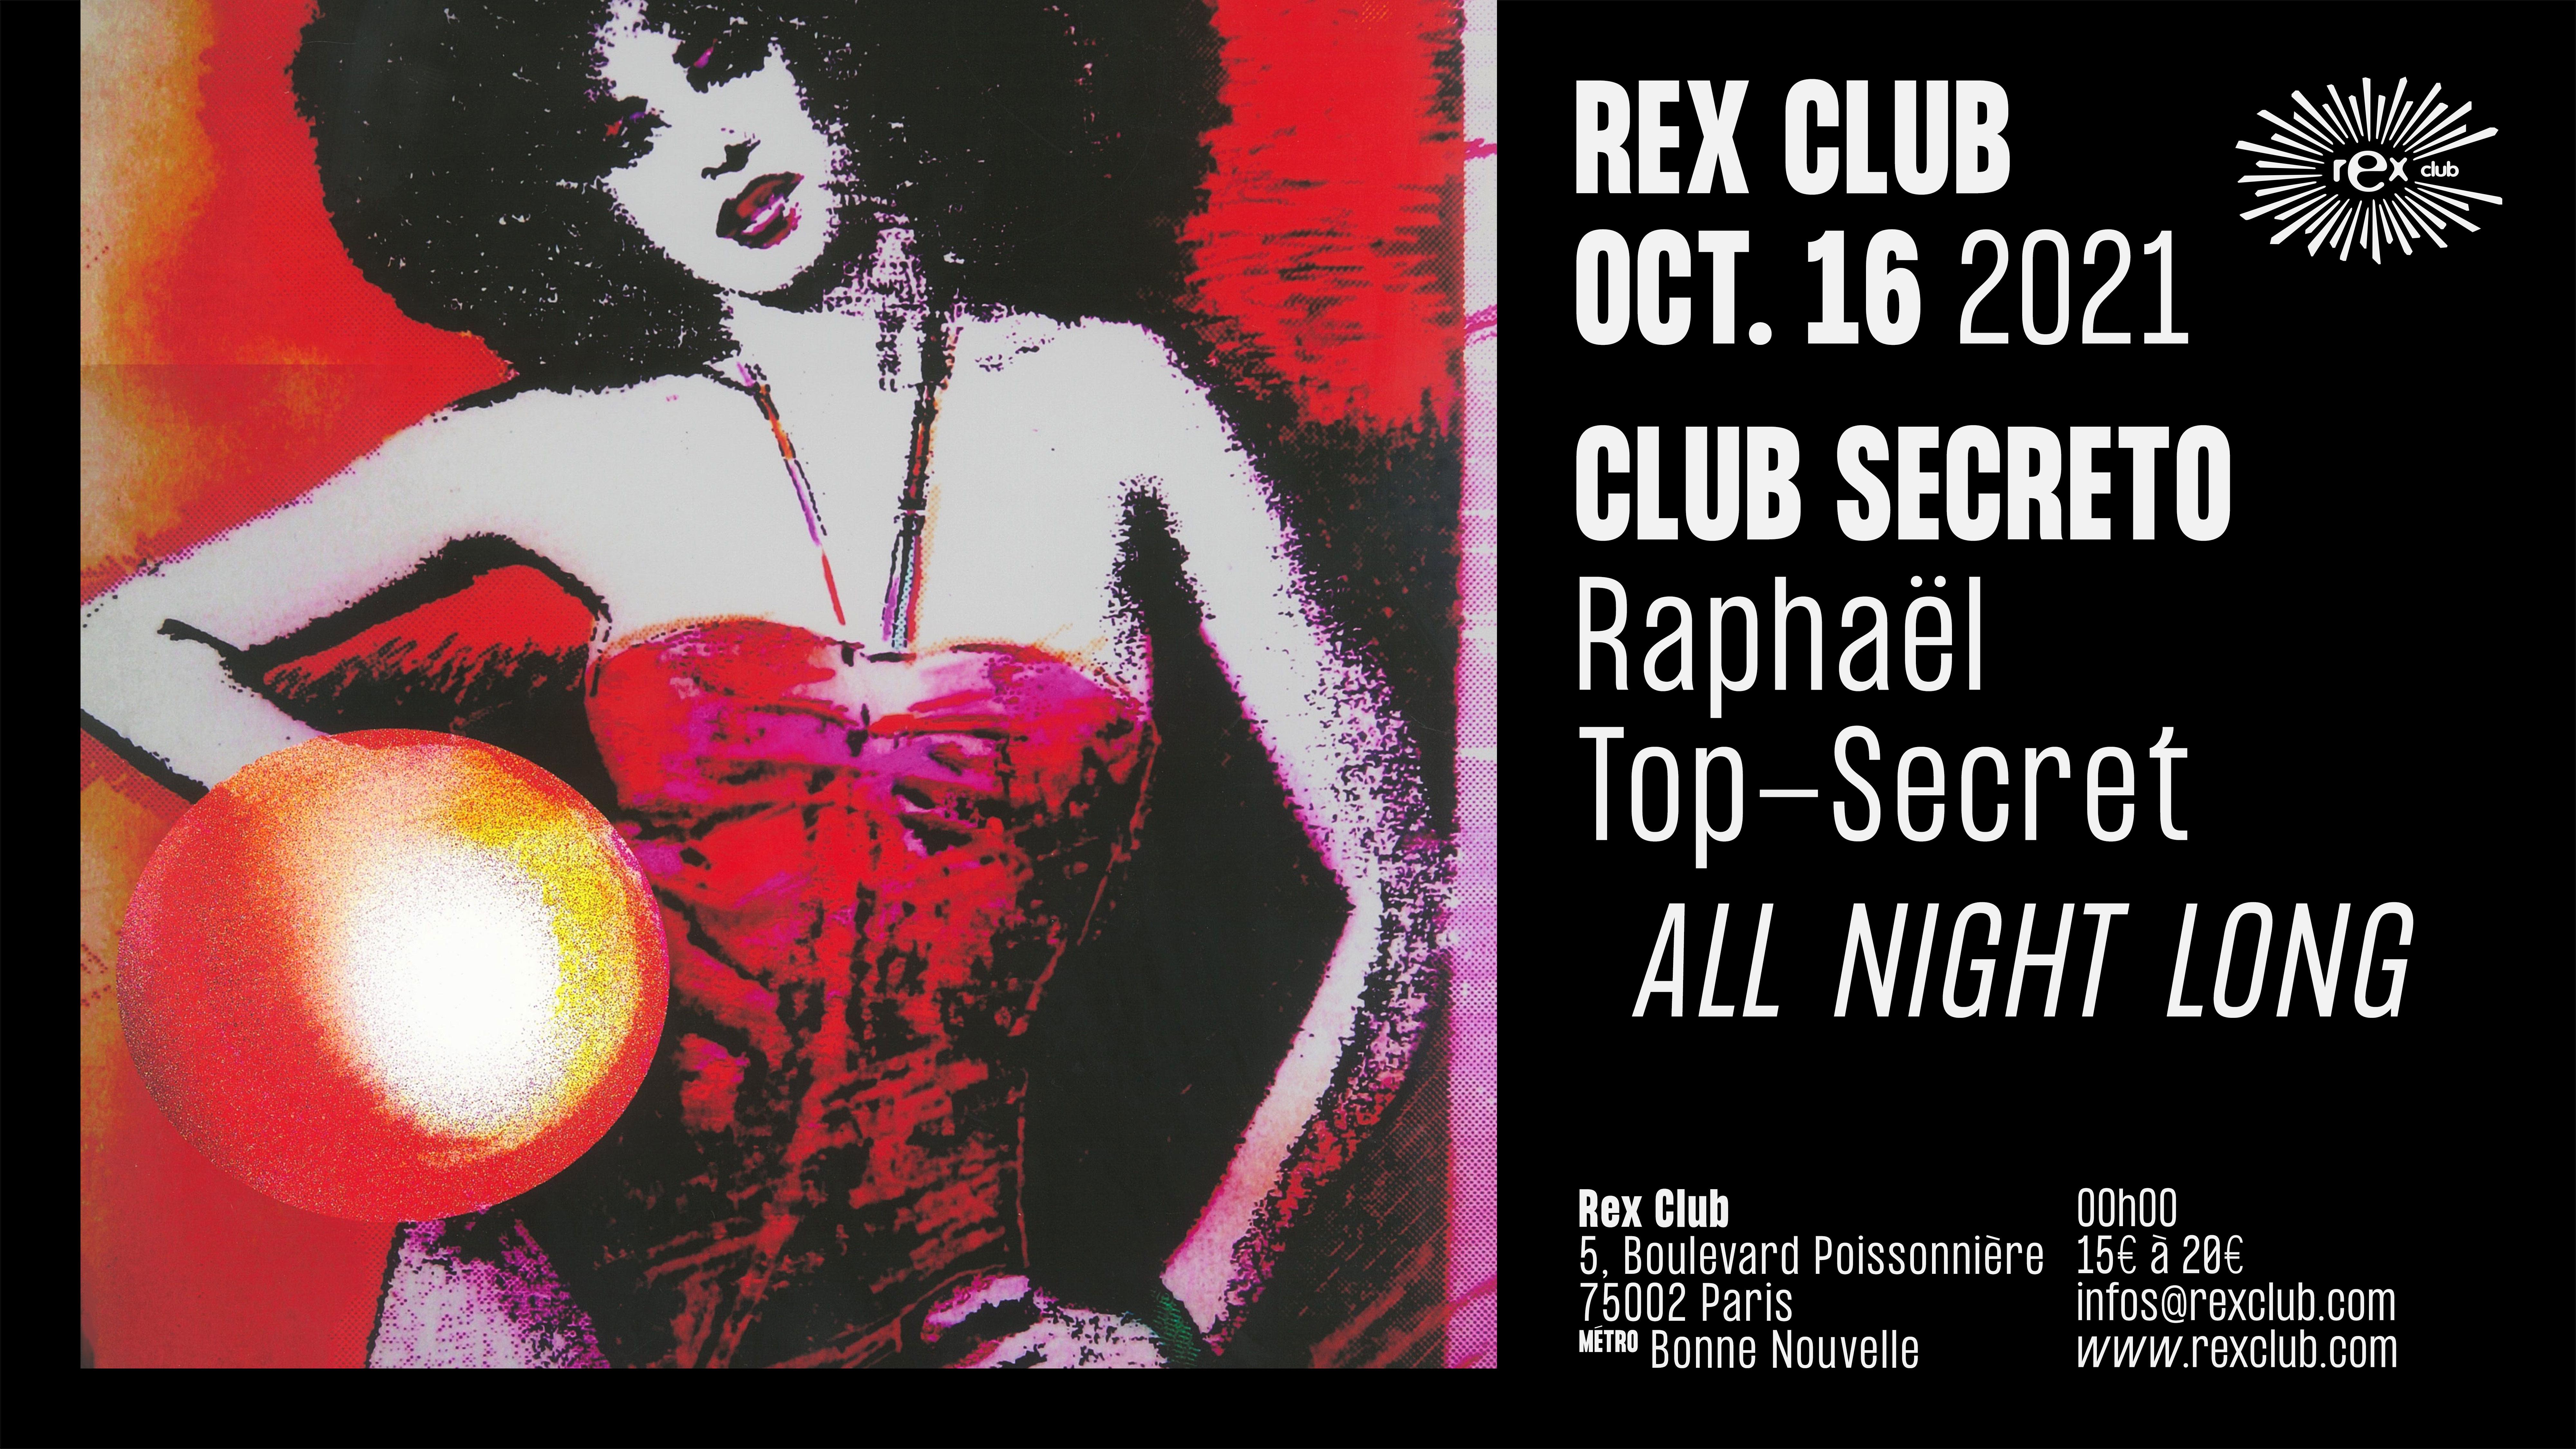 Club Secreto : Raphaël Top-Secret All Night Long